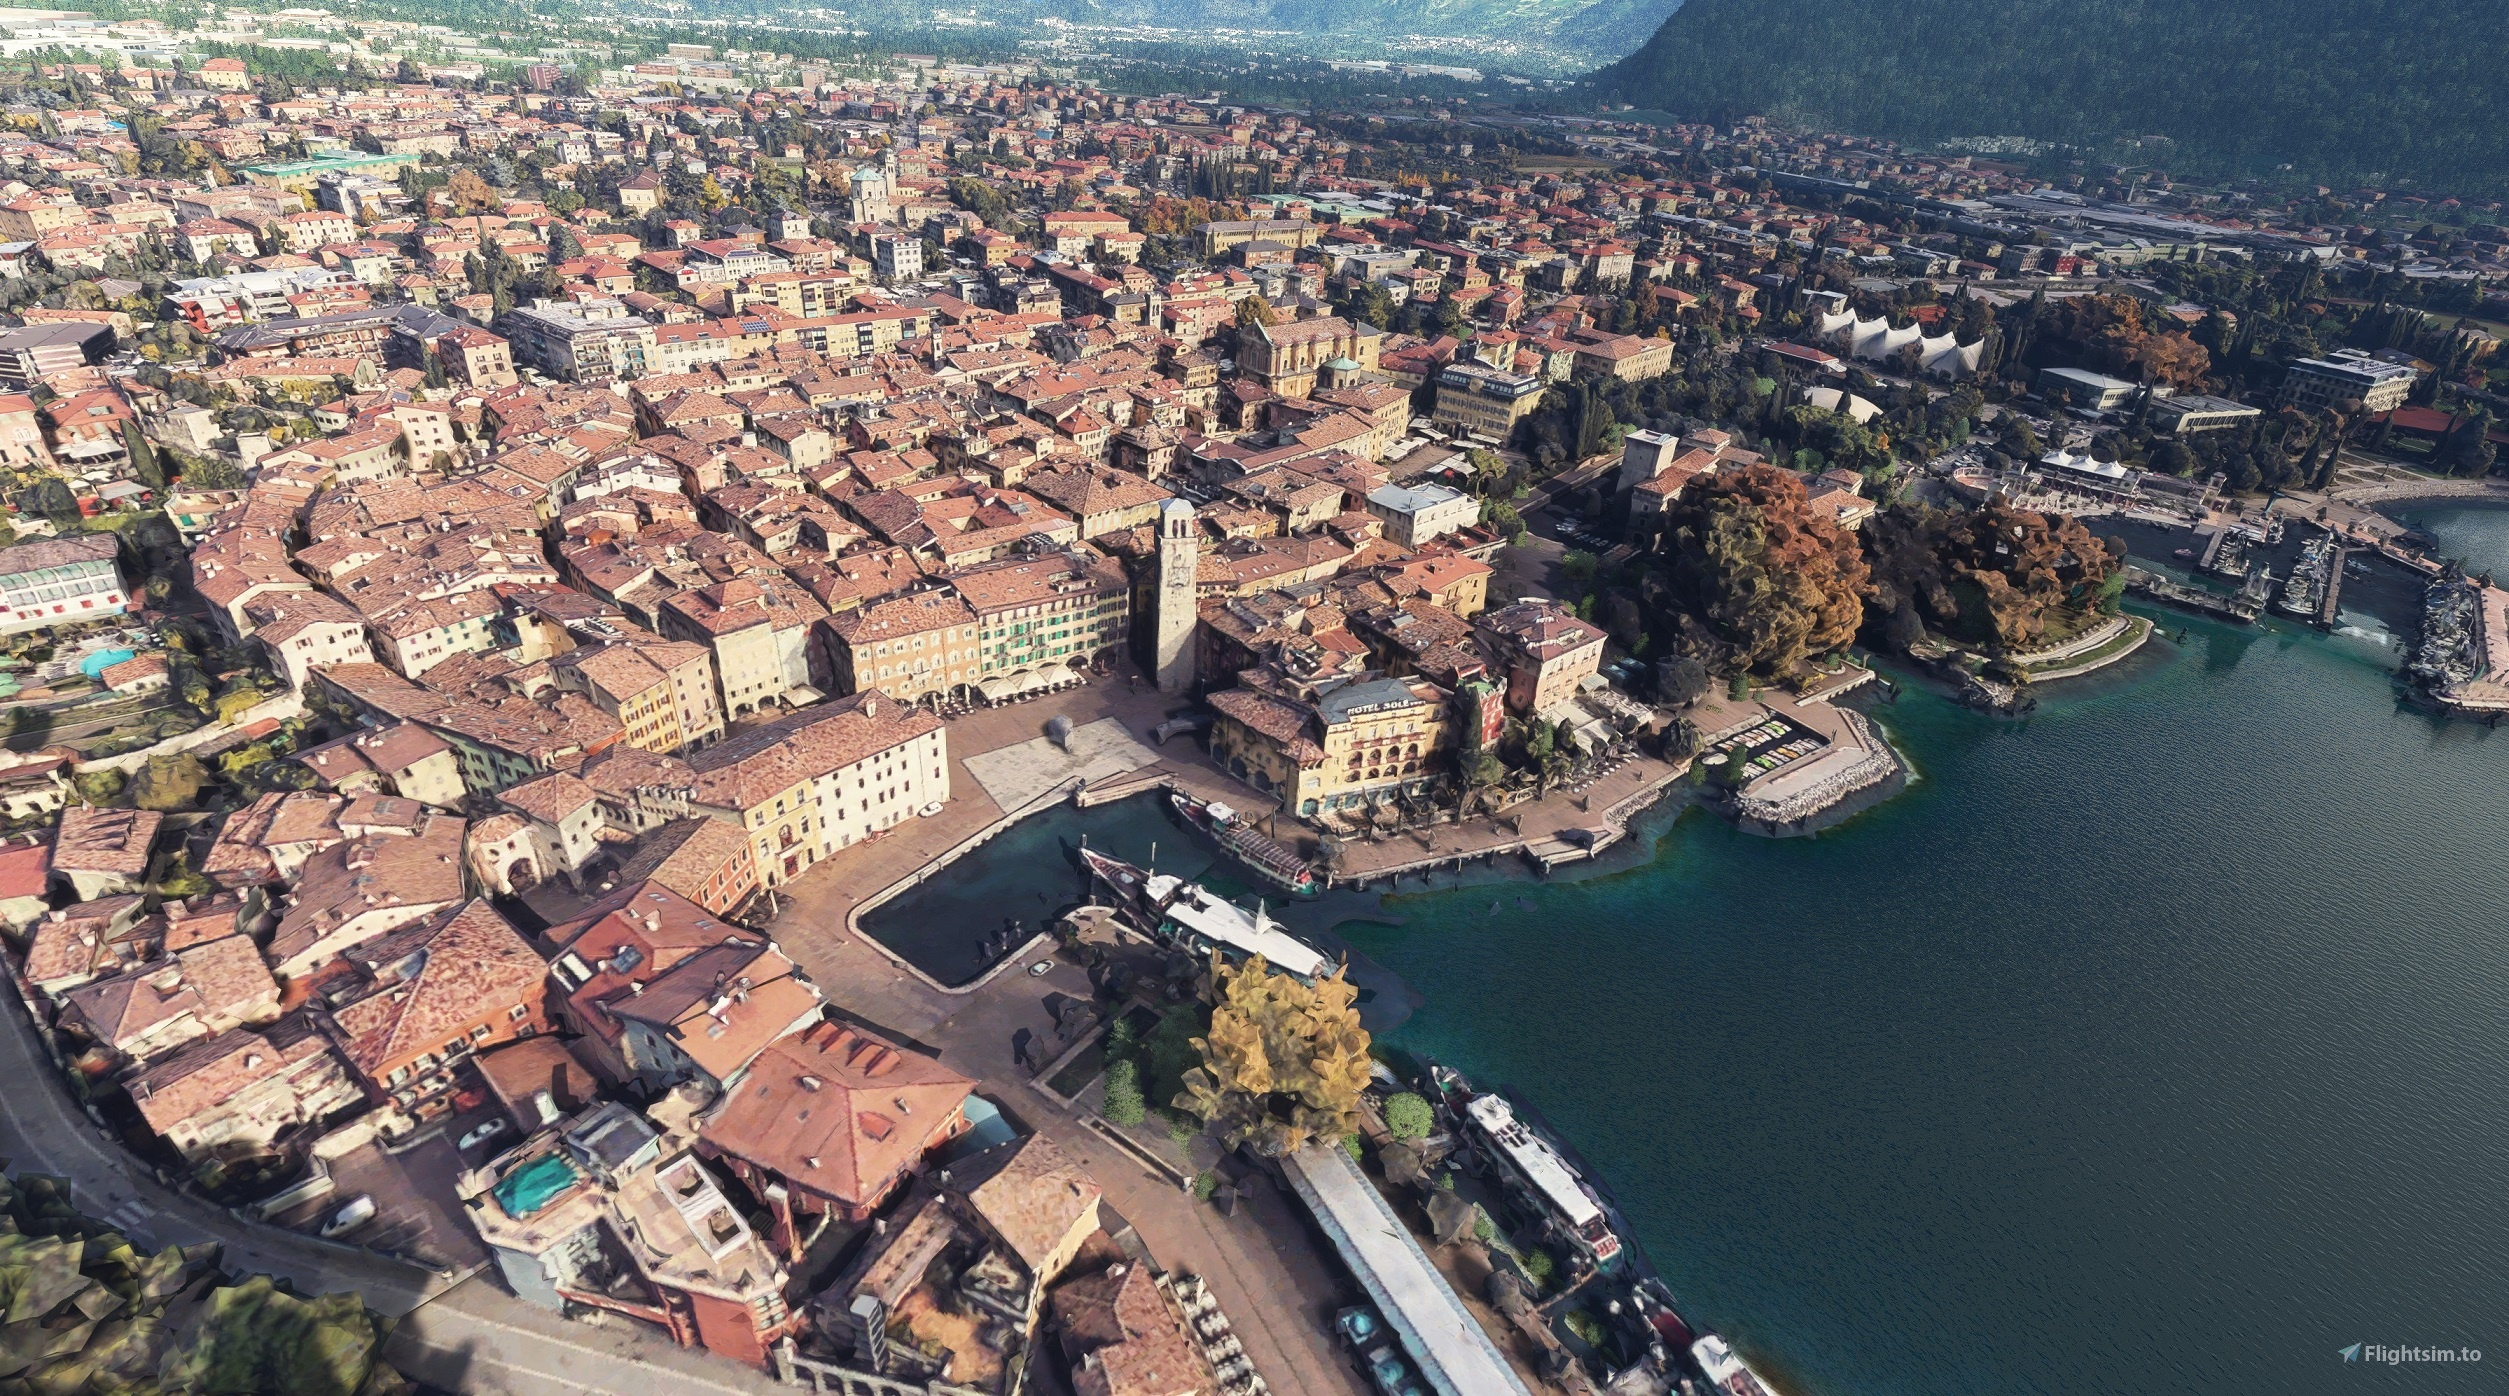 Riva Del Garda – Trentino-Alto Adige